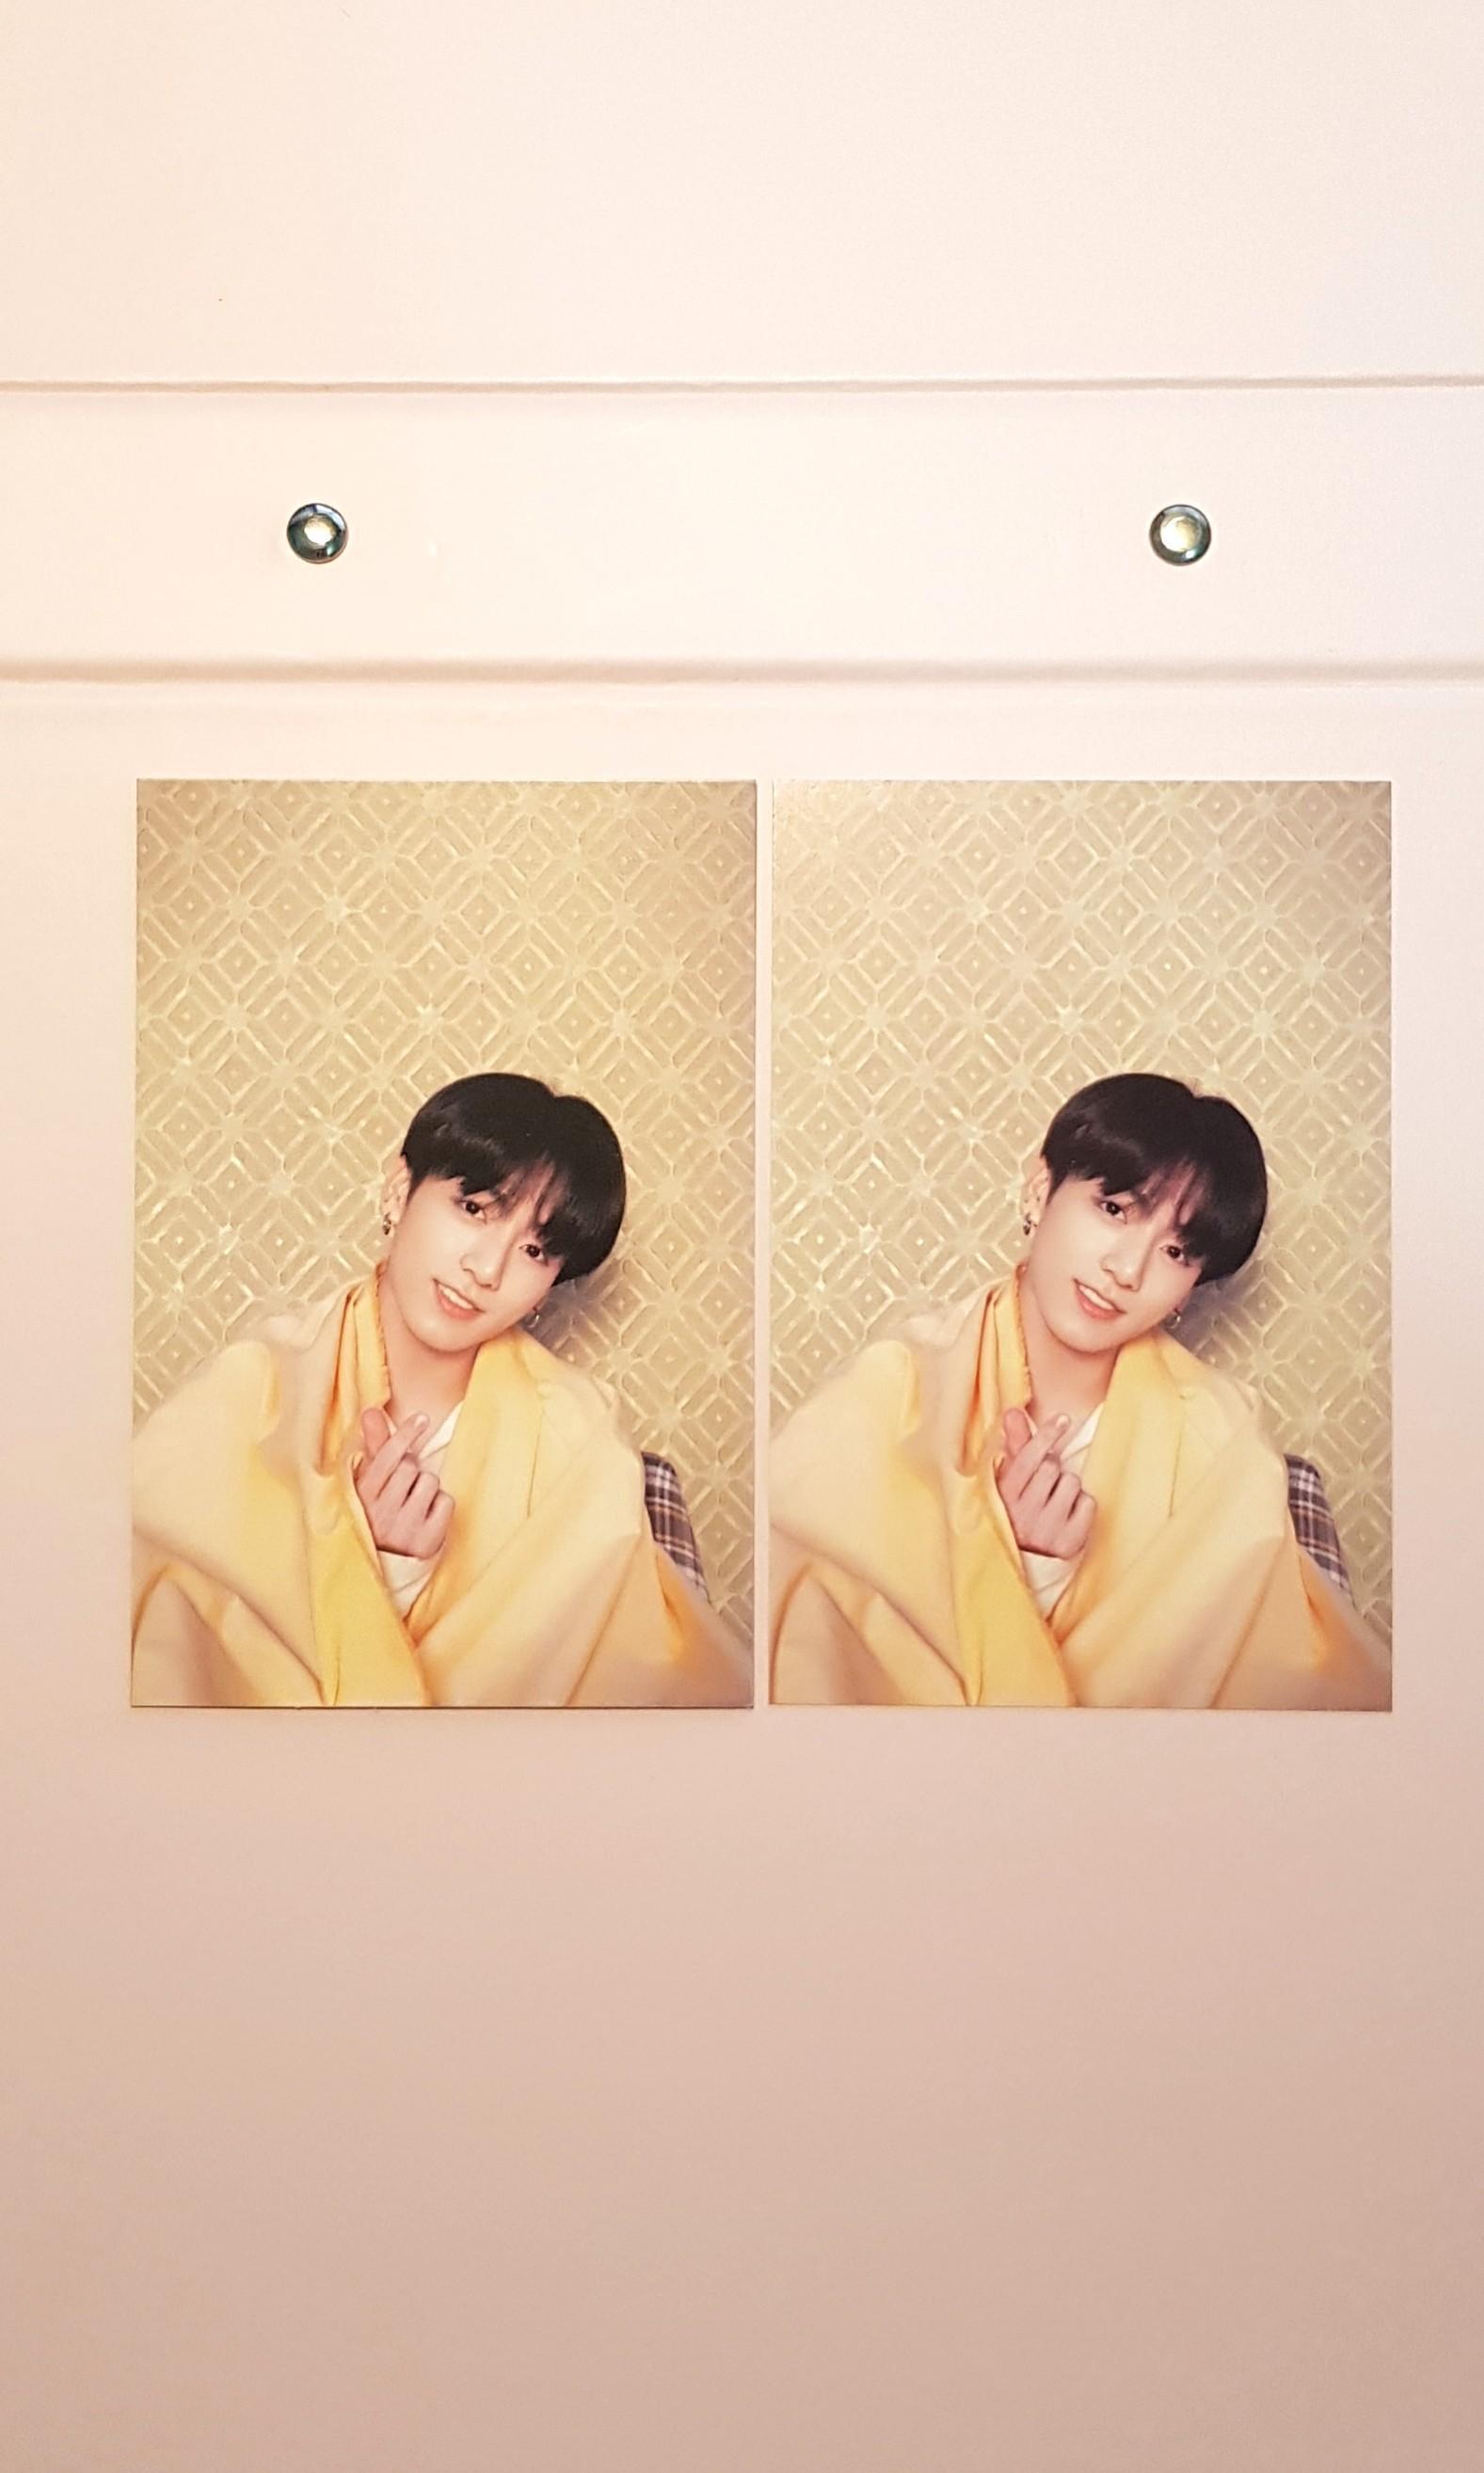 OFFICIAL BTS PERSONA Postcards [Jungkook VER.]